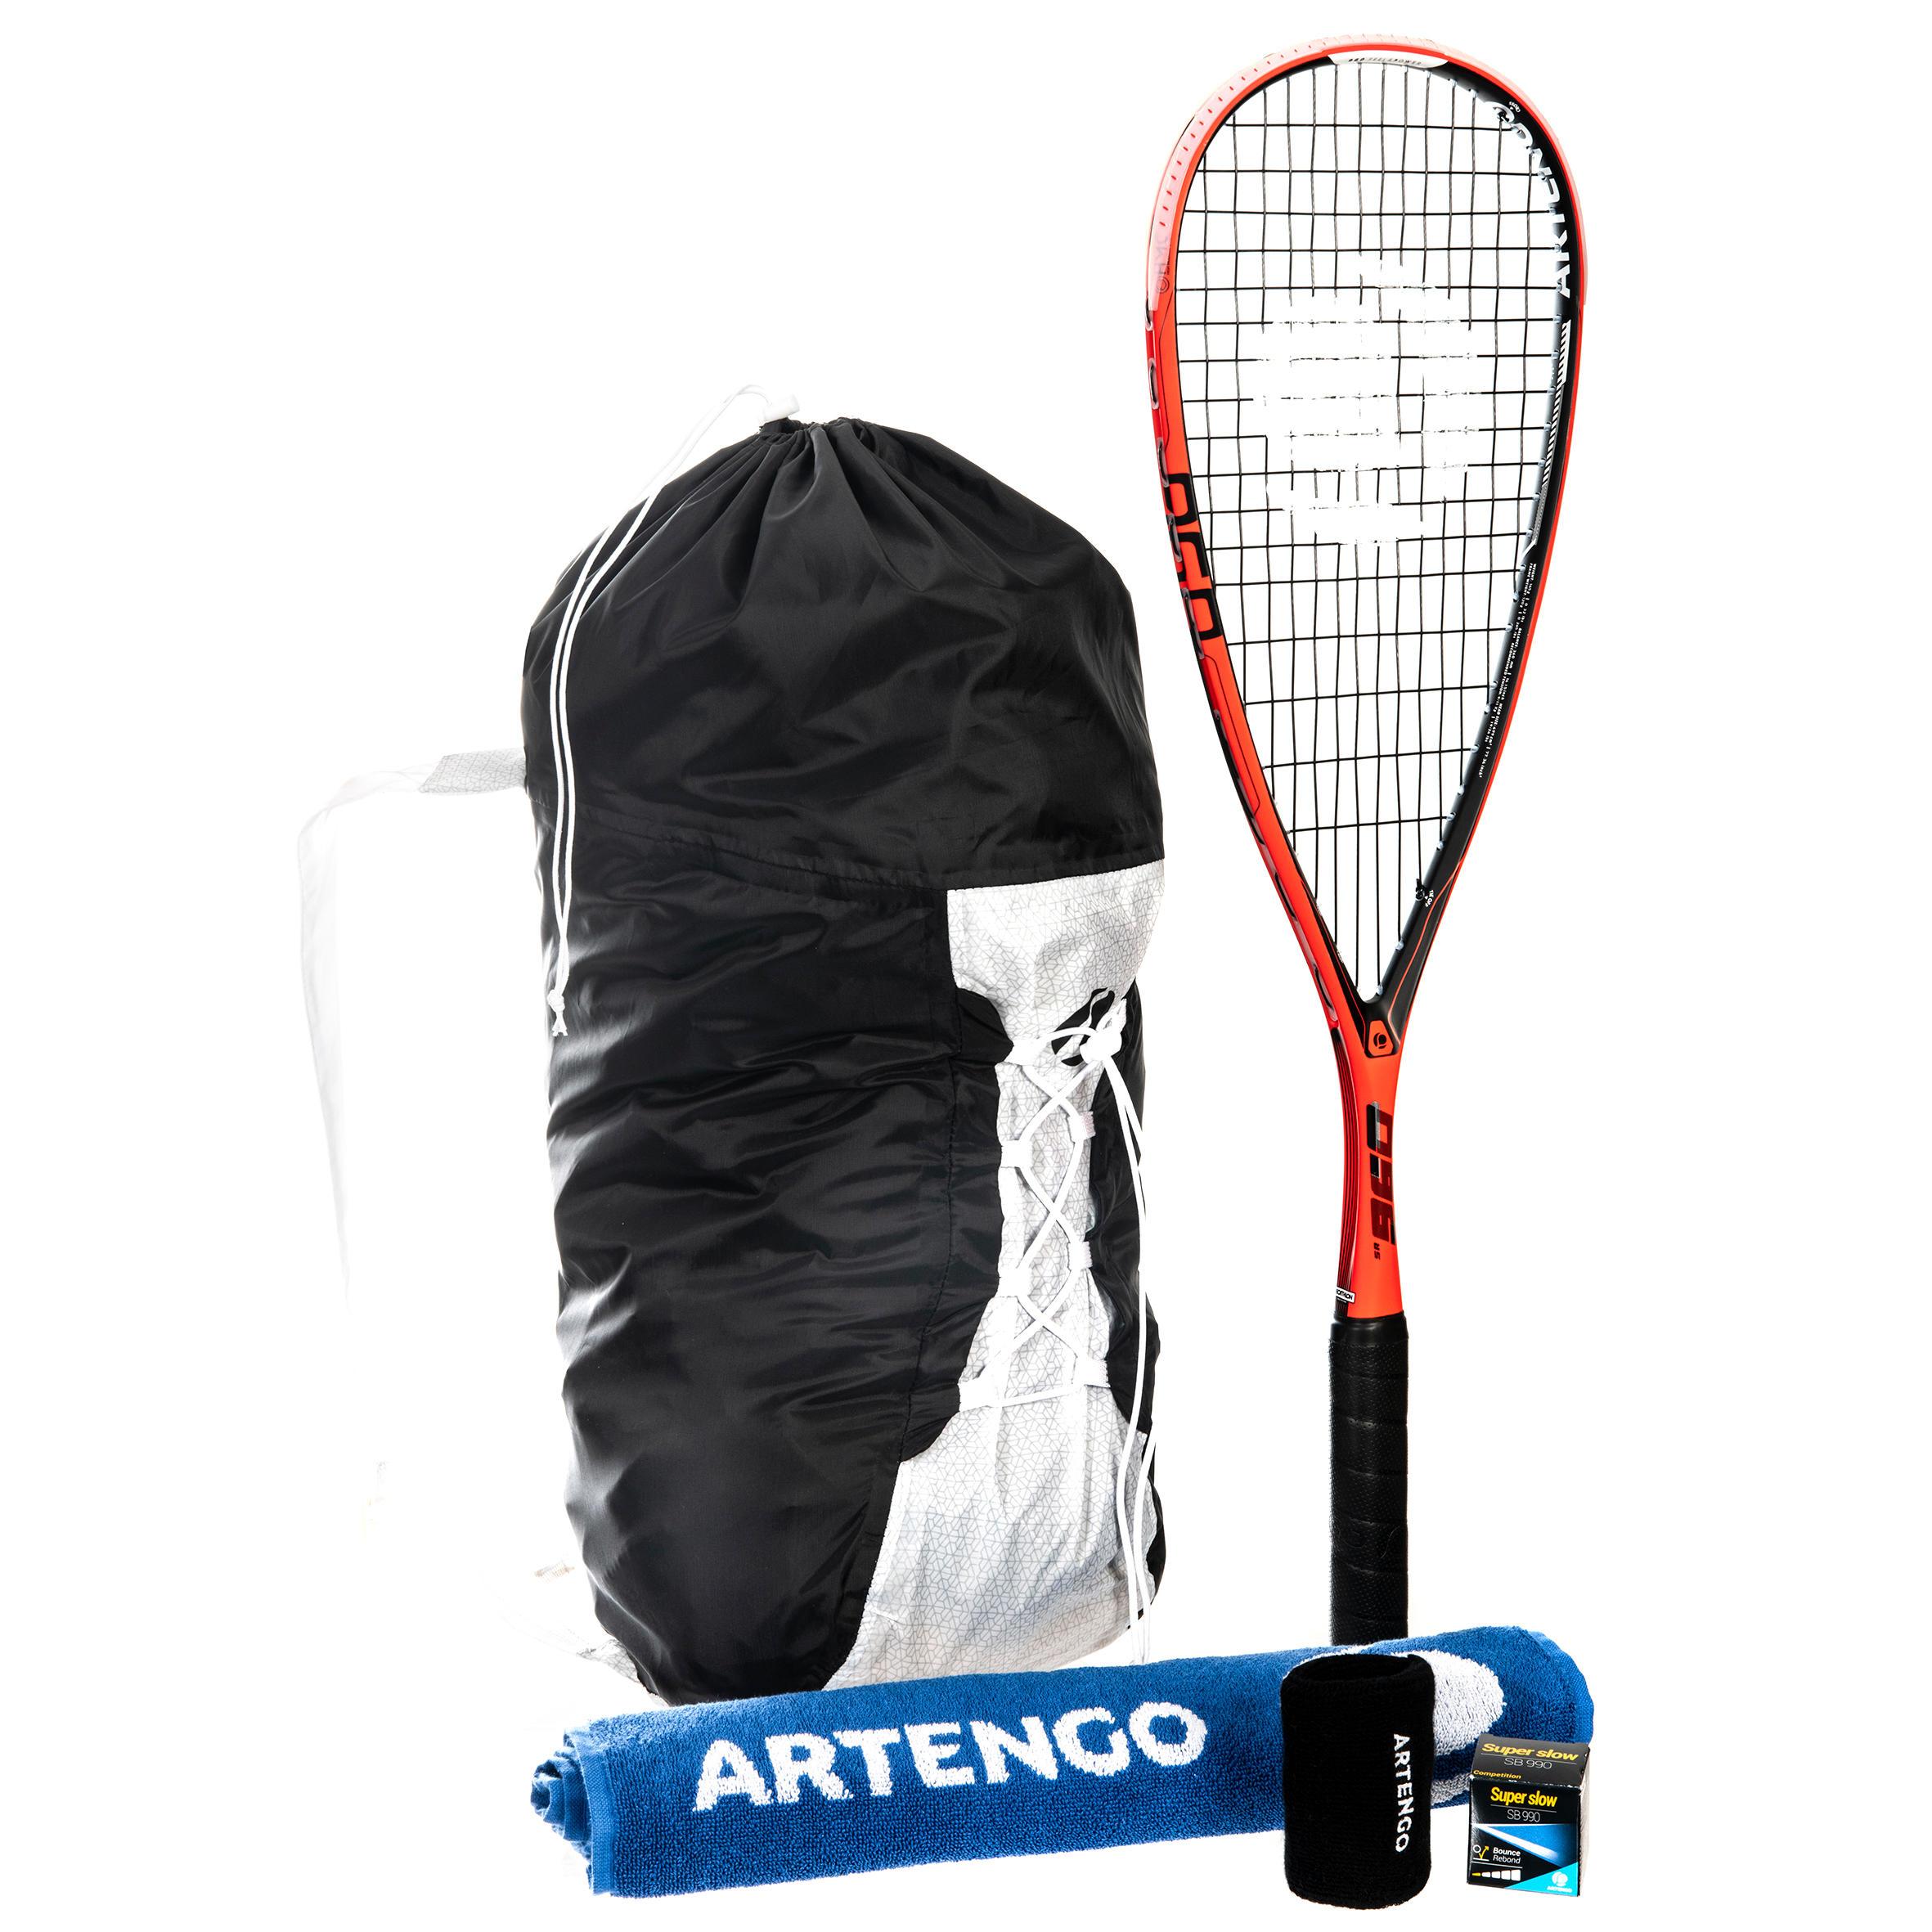 2d6f27b31e1 Artengo Set SR 960 (racket SR 960, rugzak, handdoek, bal SB990,